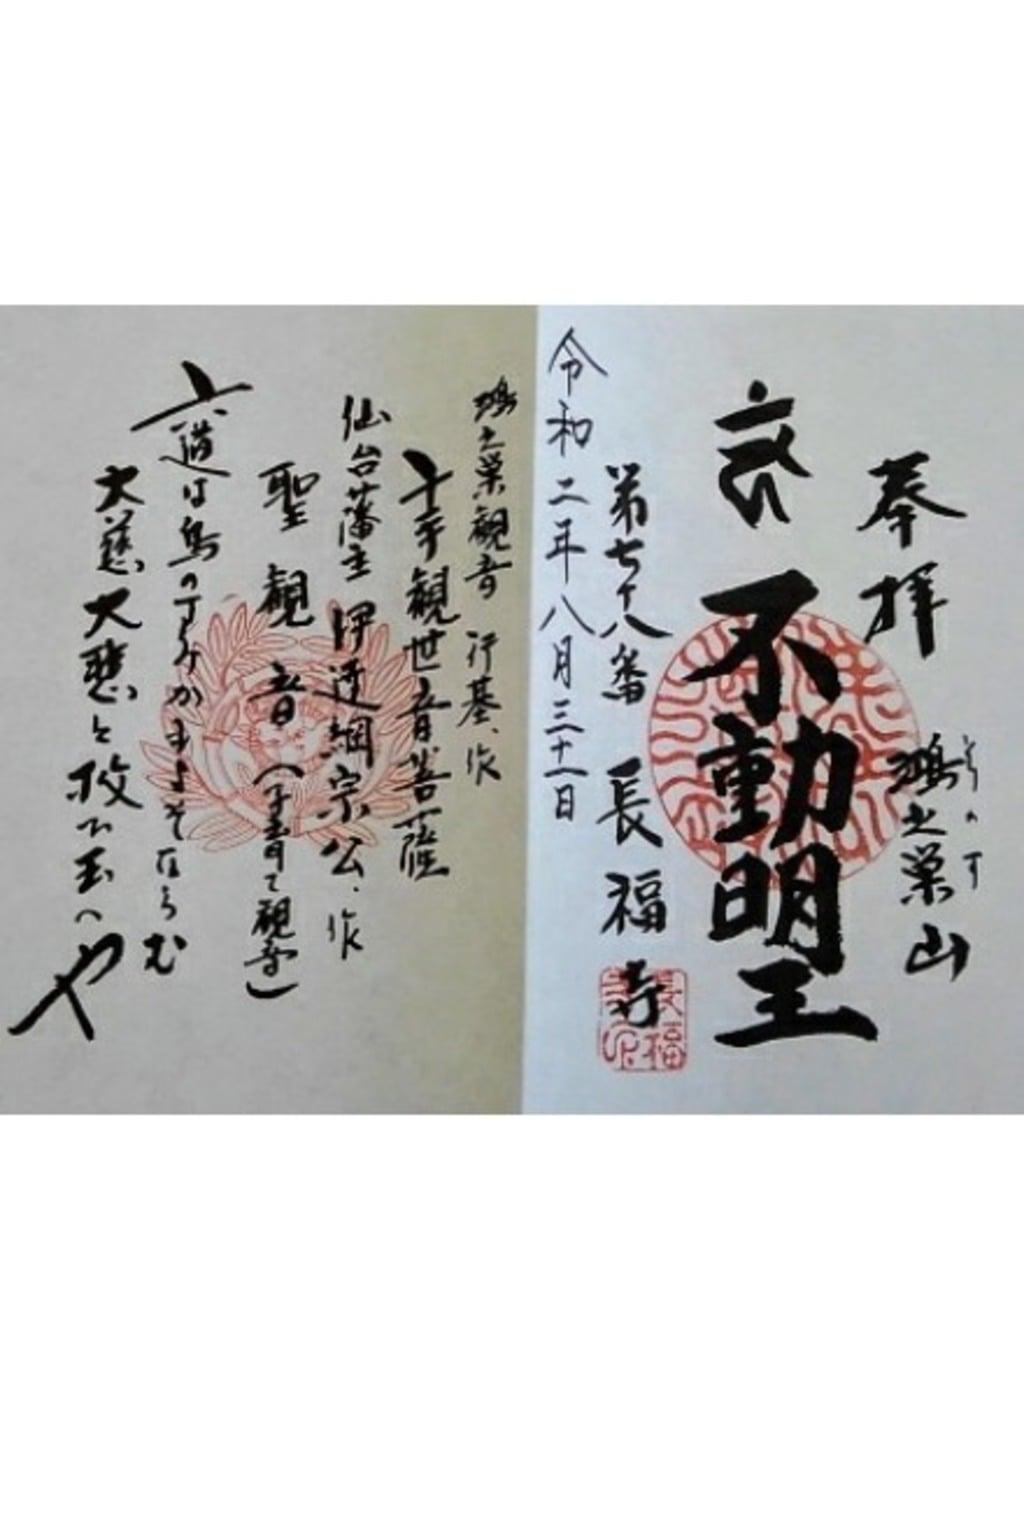 長福寺の御朱印帳